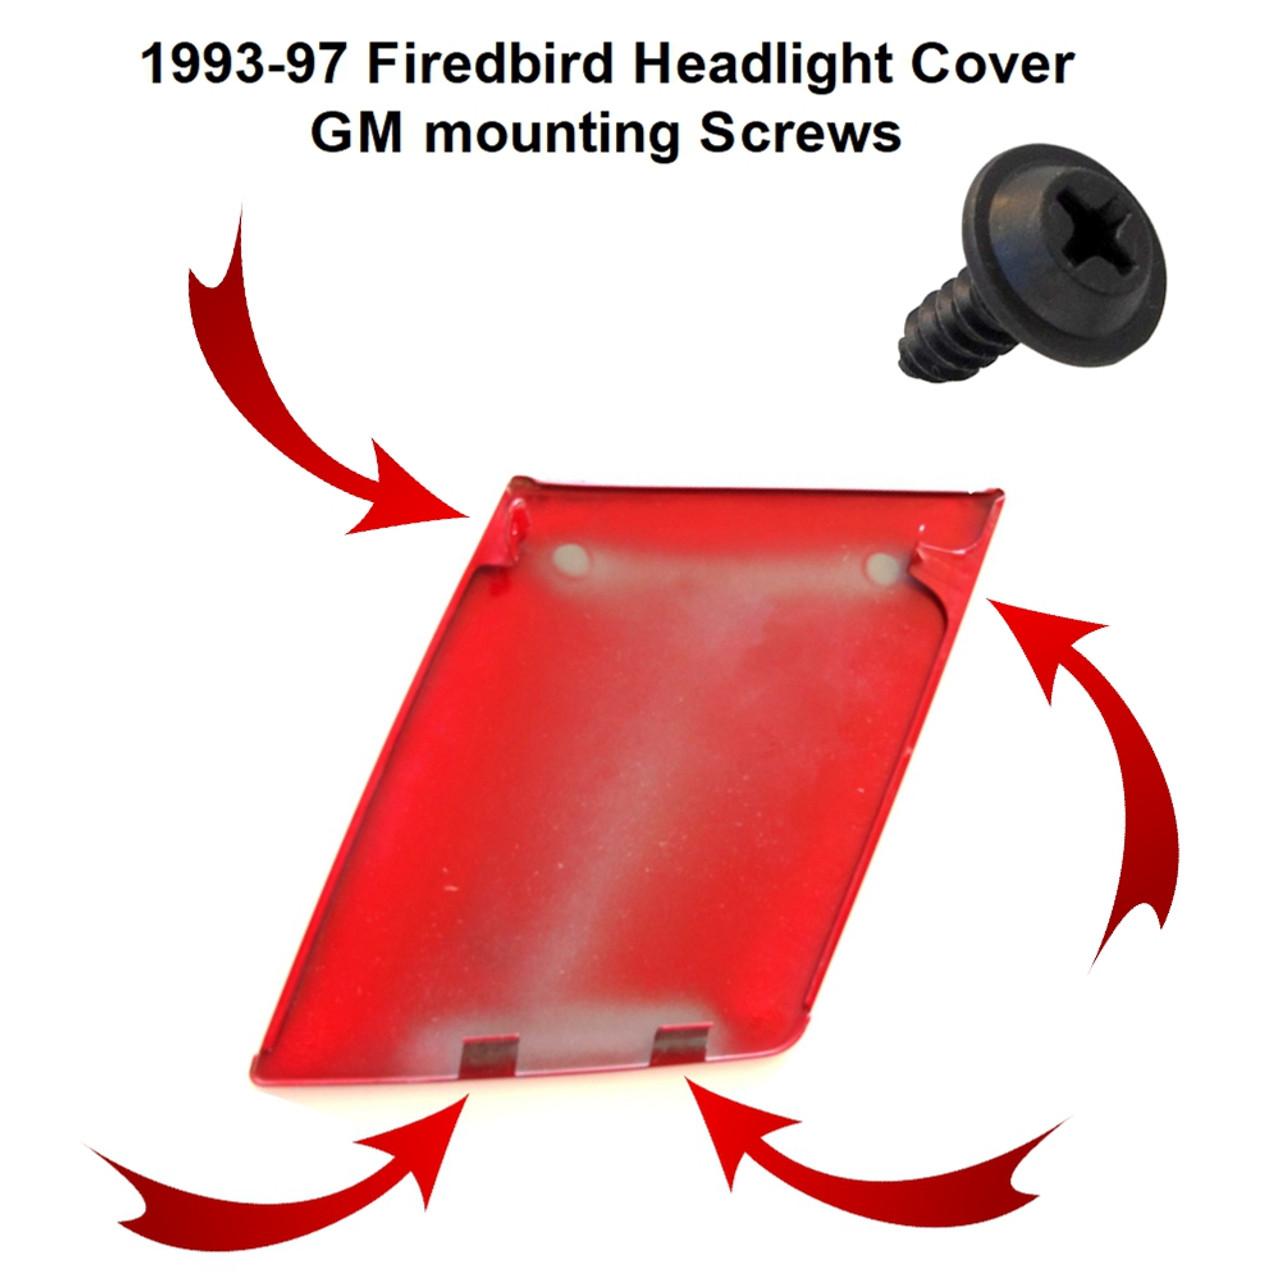 1993-1997 Firebird Headlight Cover GM Mounting Screw Set location diagram